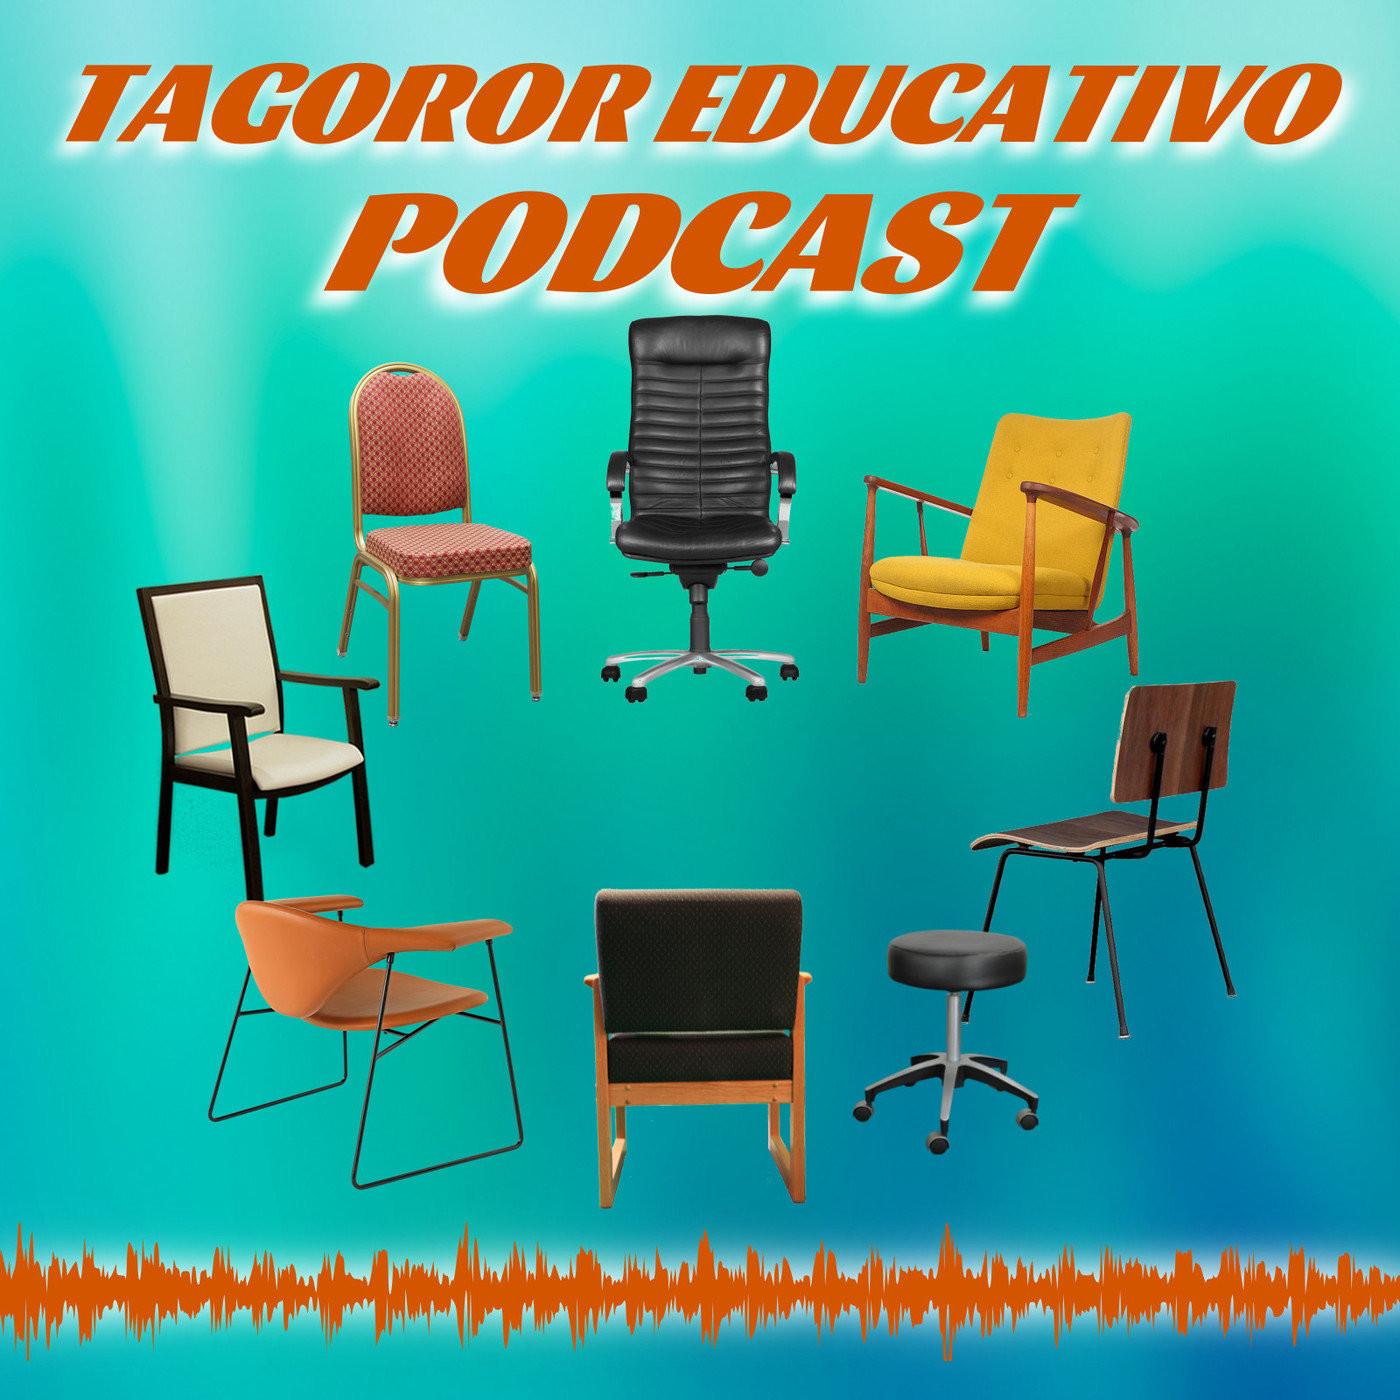 <![CDATA[Tagoror Educativo Podcast]]>